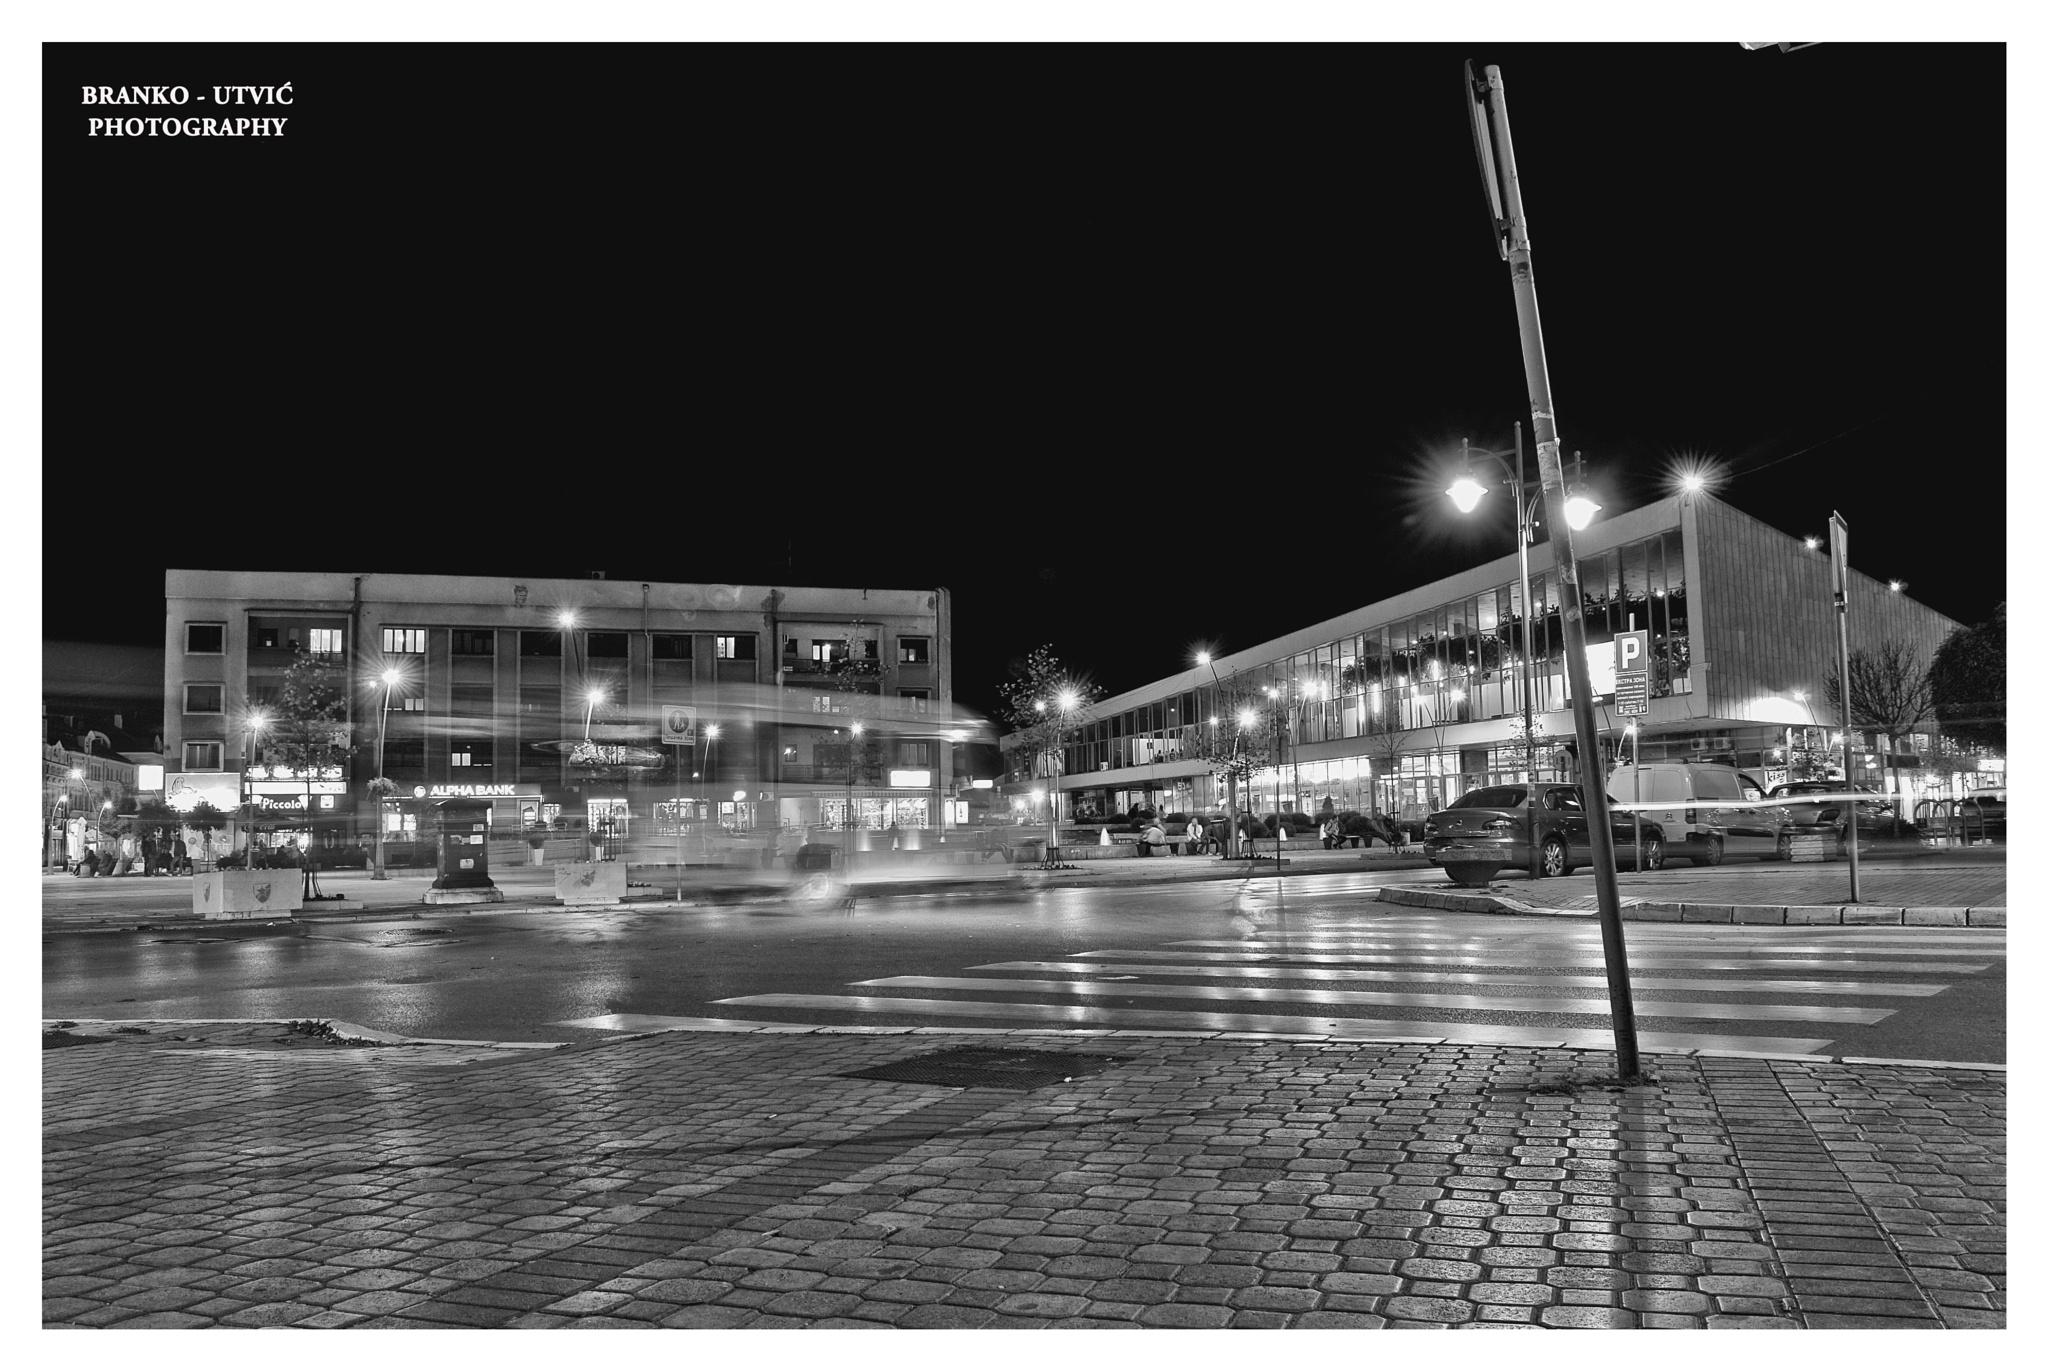 cacak nocu by branko.utvic